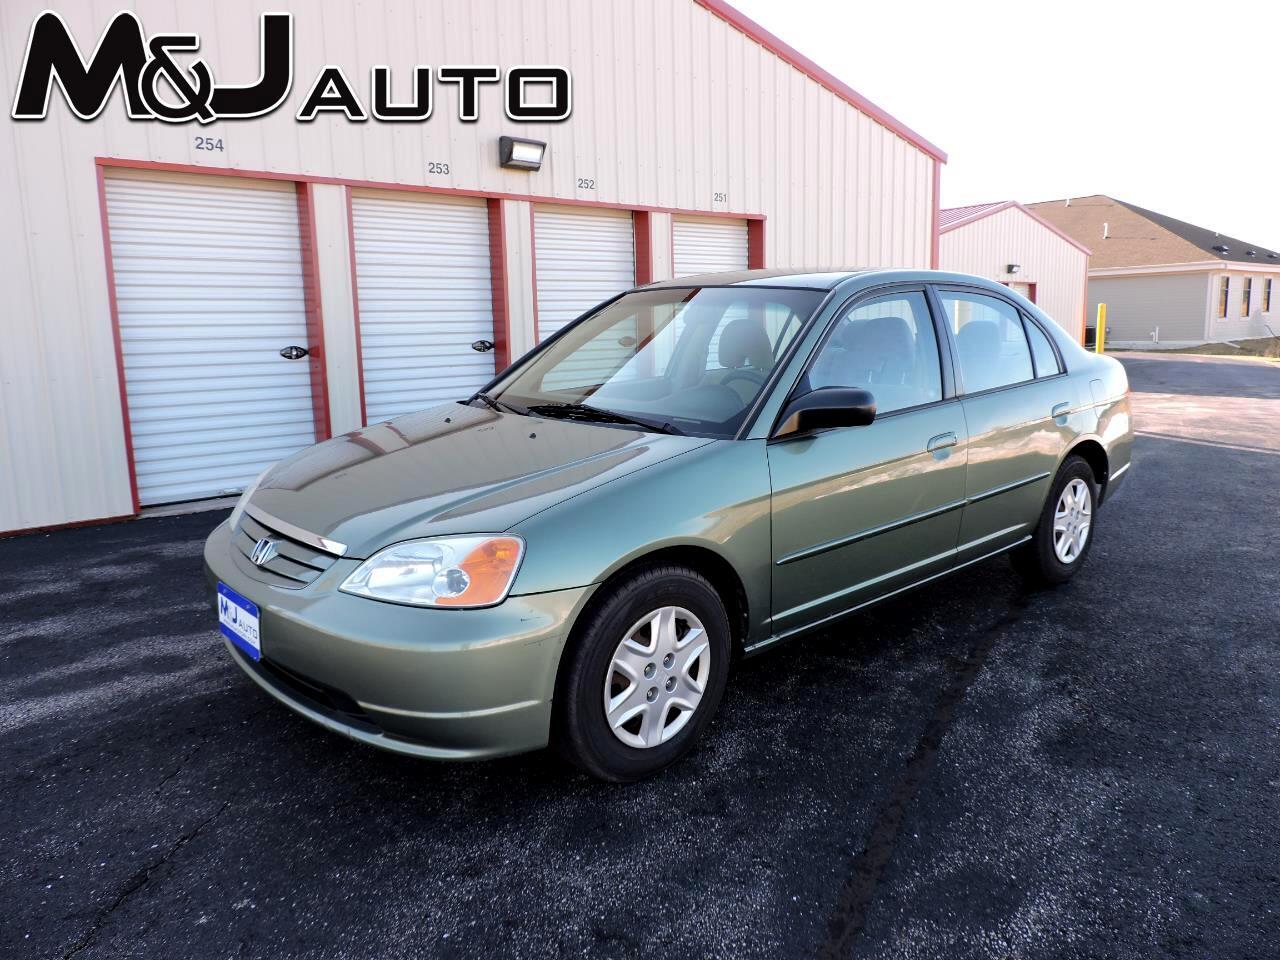 Honda Civic 4dr Sdn LX Auto 2003